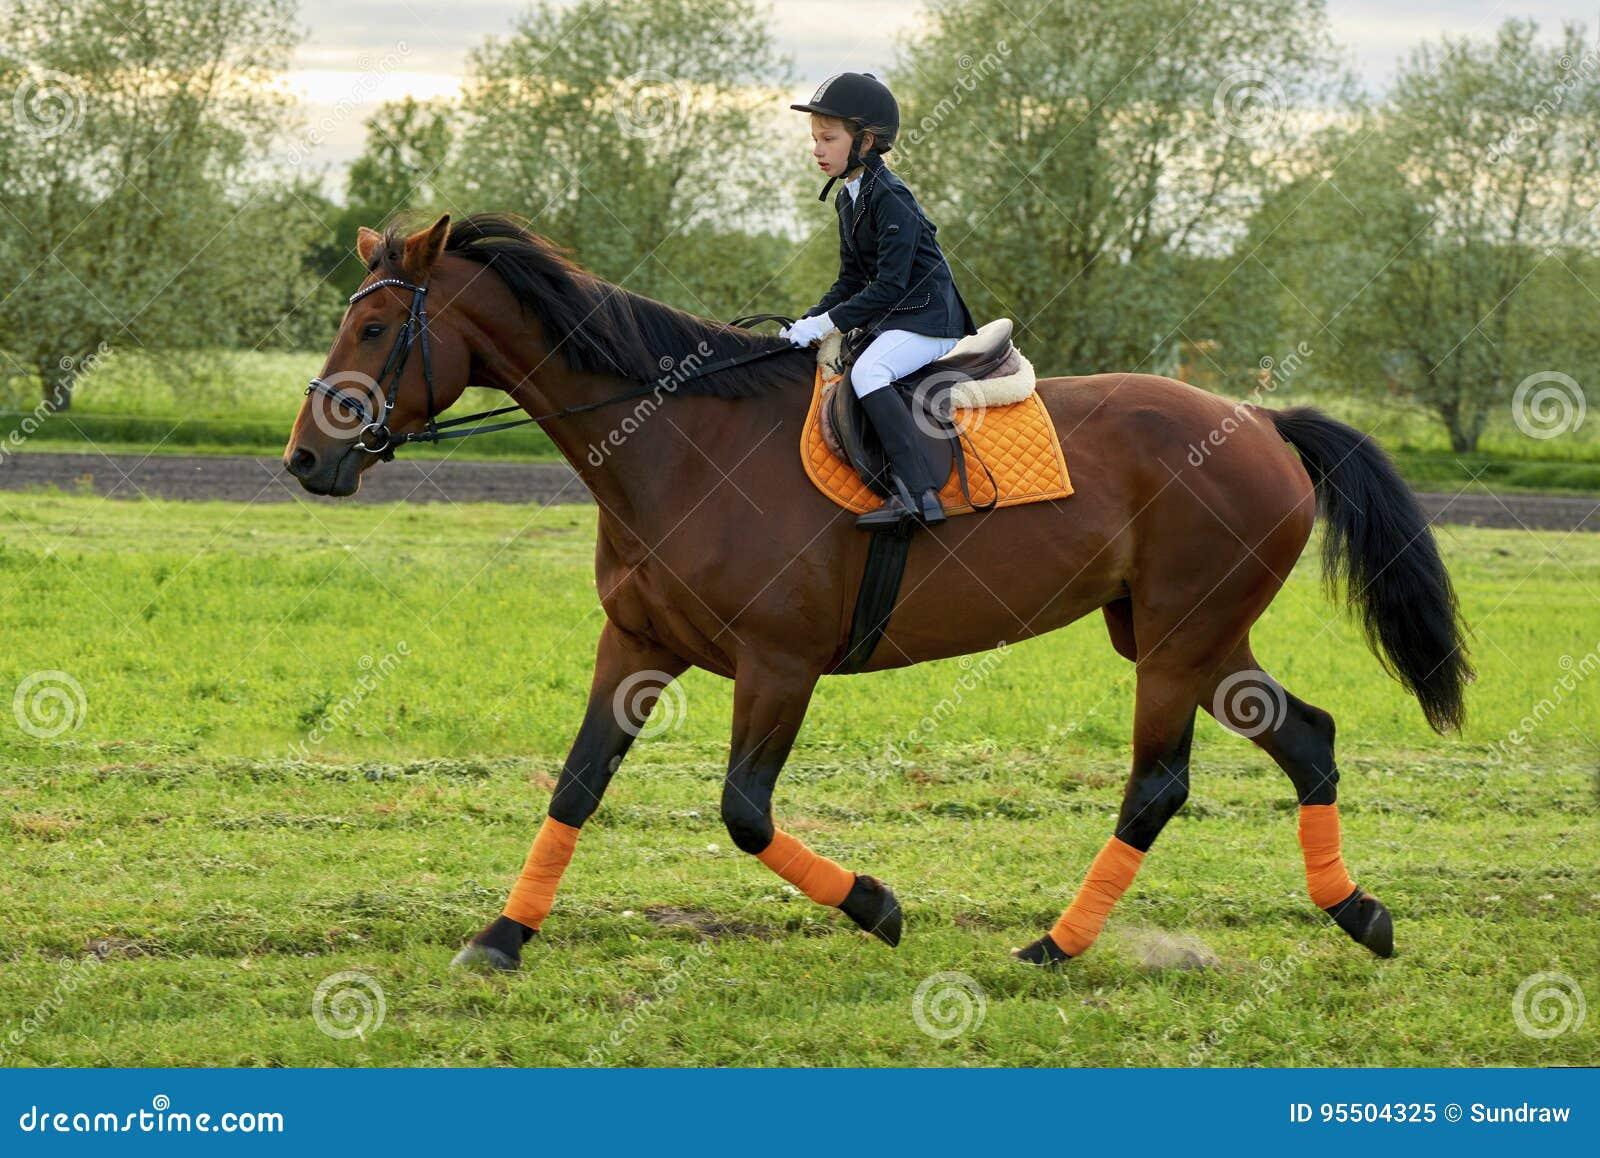 Jockey μικρών κοριτσιών που οδηγά ένα άλογο σε ολόκληρη τη χώρα στην επαγγελματική εξάρτηση